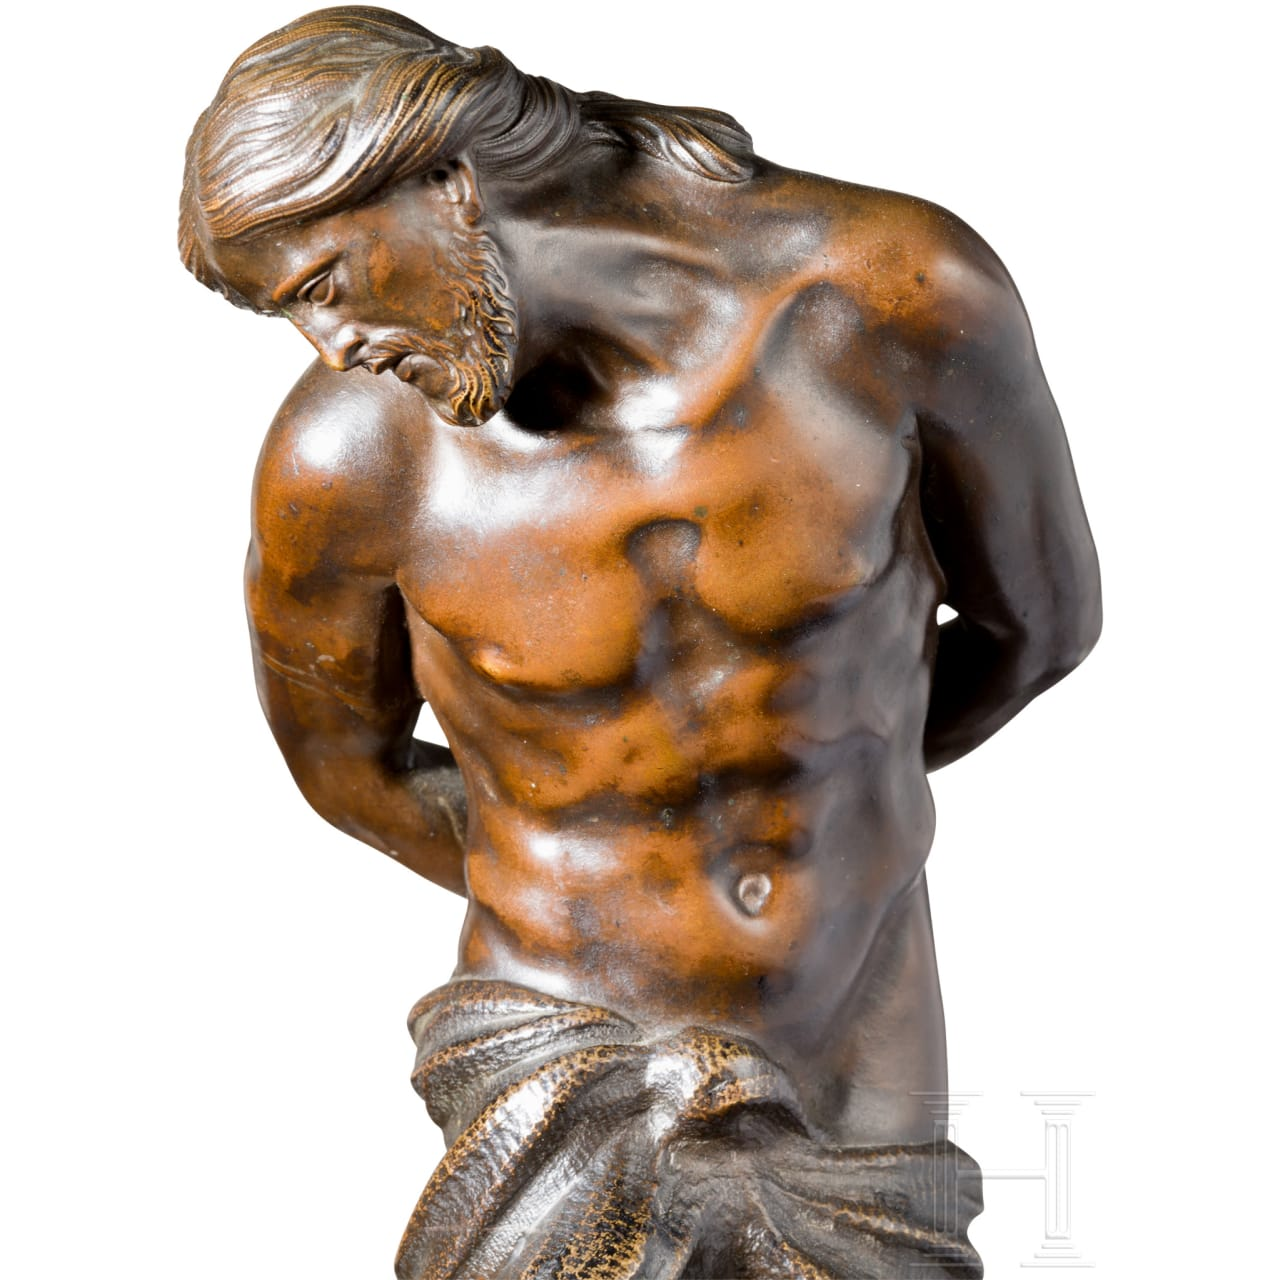 Feine Skulptur des Christus an der Geißelsäule nach A. Algardi, genannt L'Algarde, Bologna, 17. Jhdt.